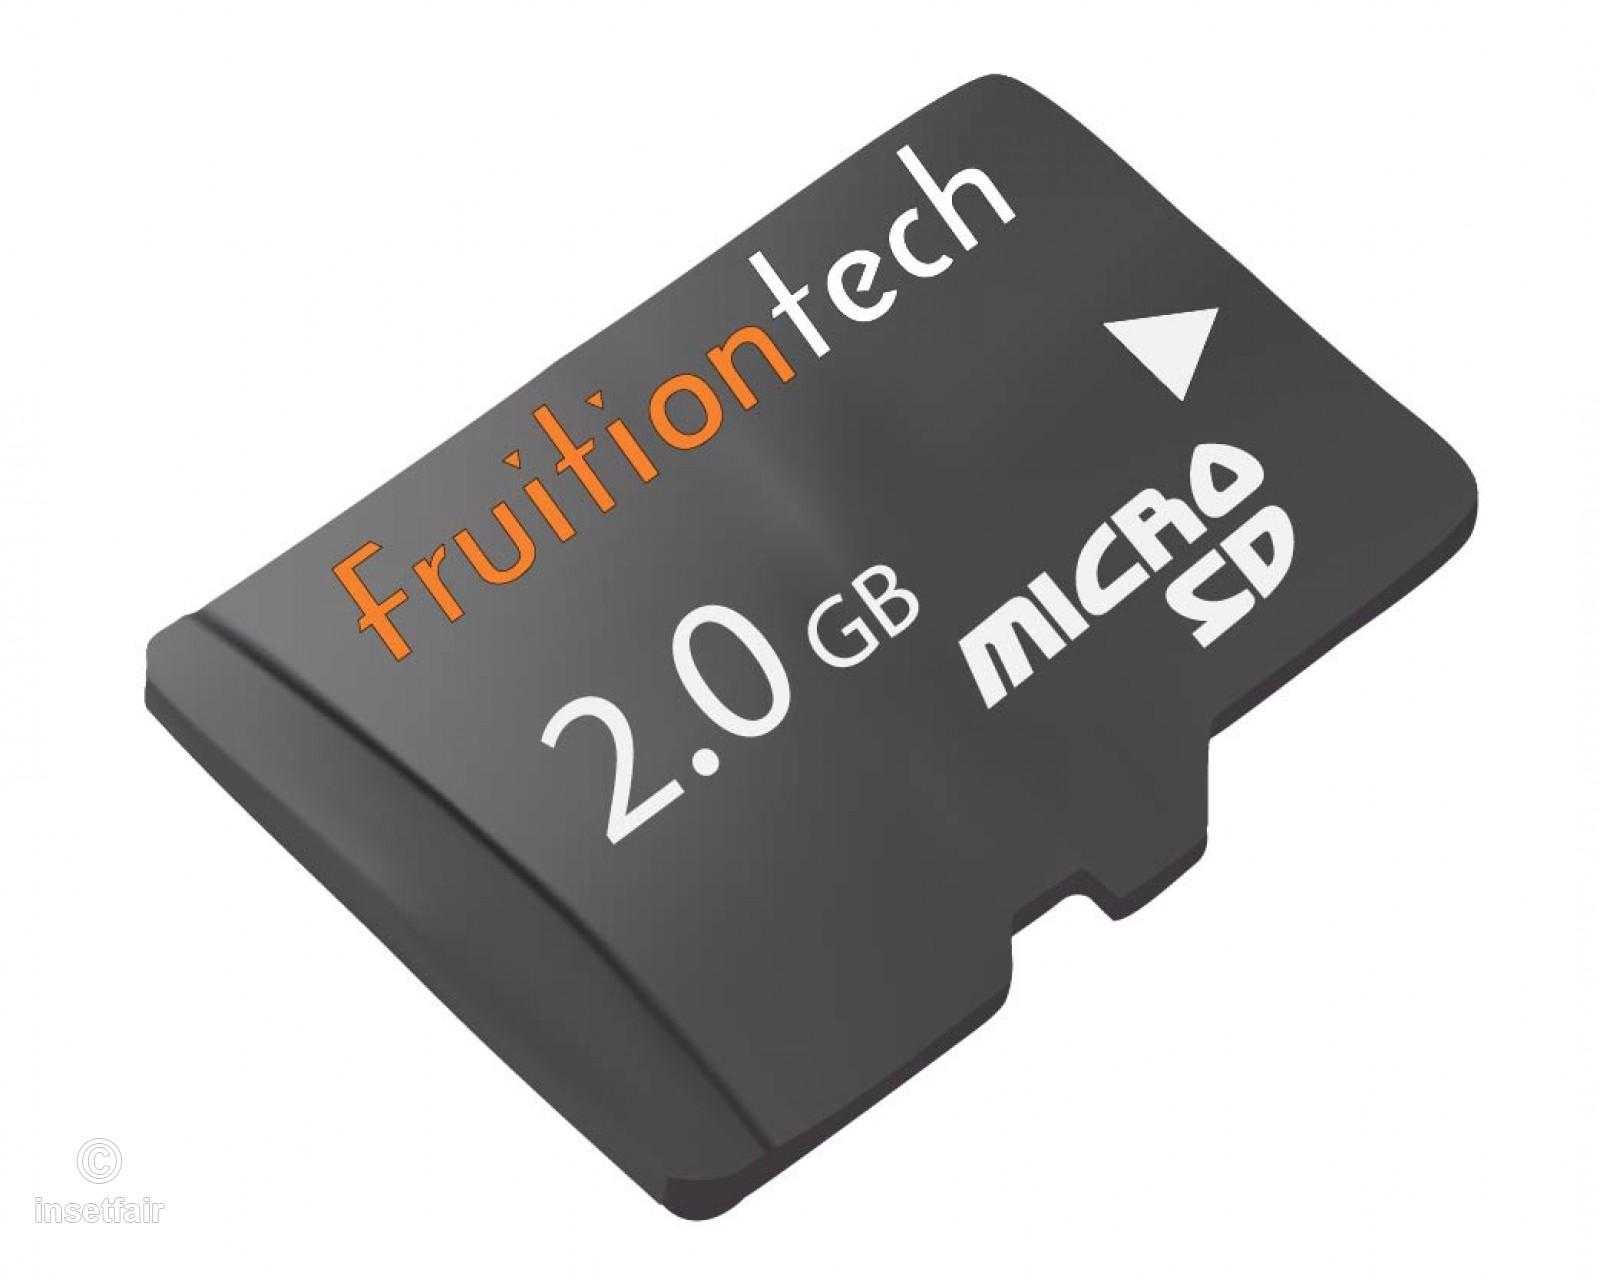 1600x1280 Micro Sd 2 Gb Memory Card Vector Png Image